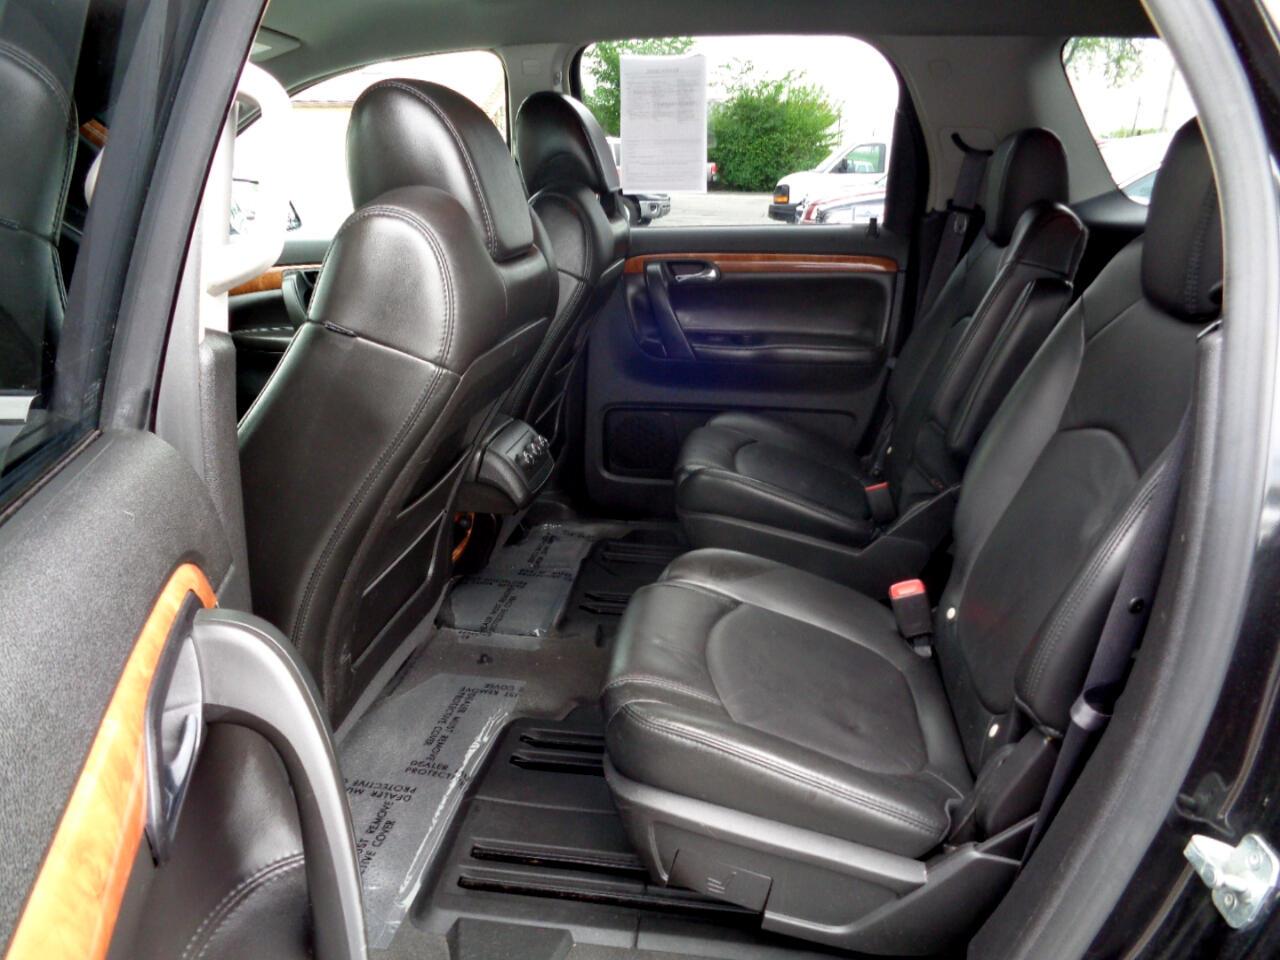 2008 Saturn Outlook XR AWD